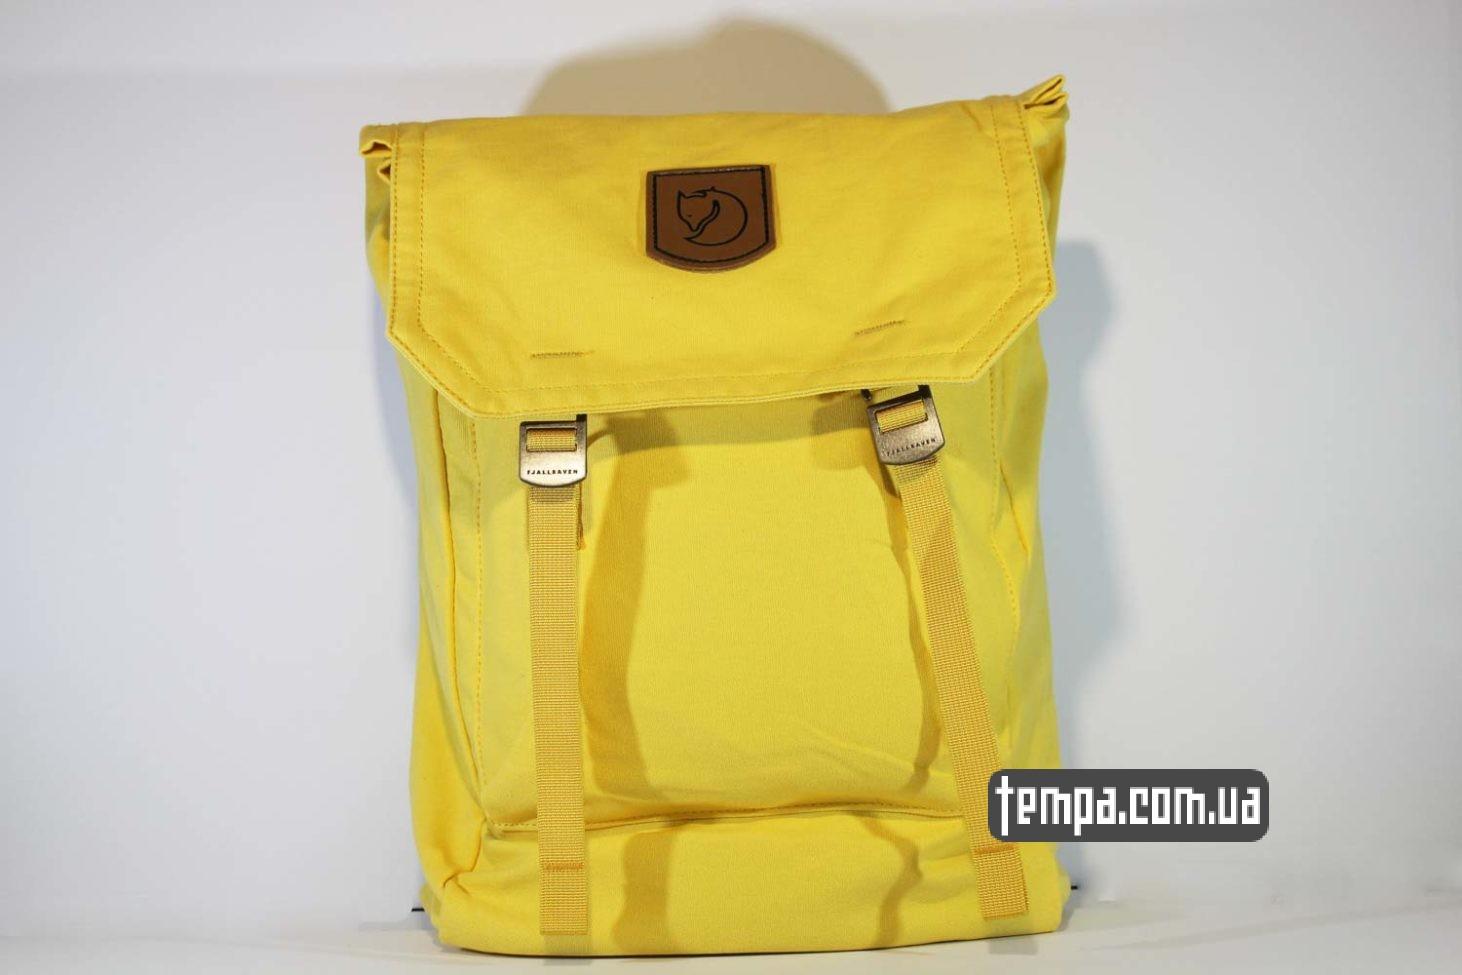 рюкзак сумка FOLDSACK NO.1 fjallraven kanken желтый